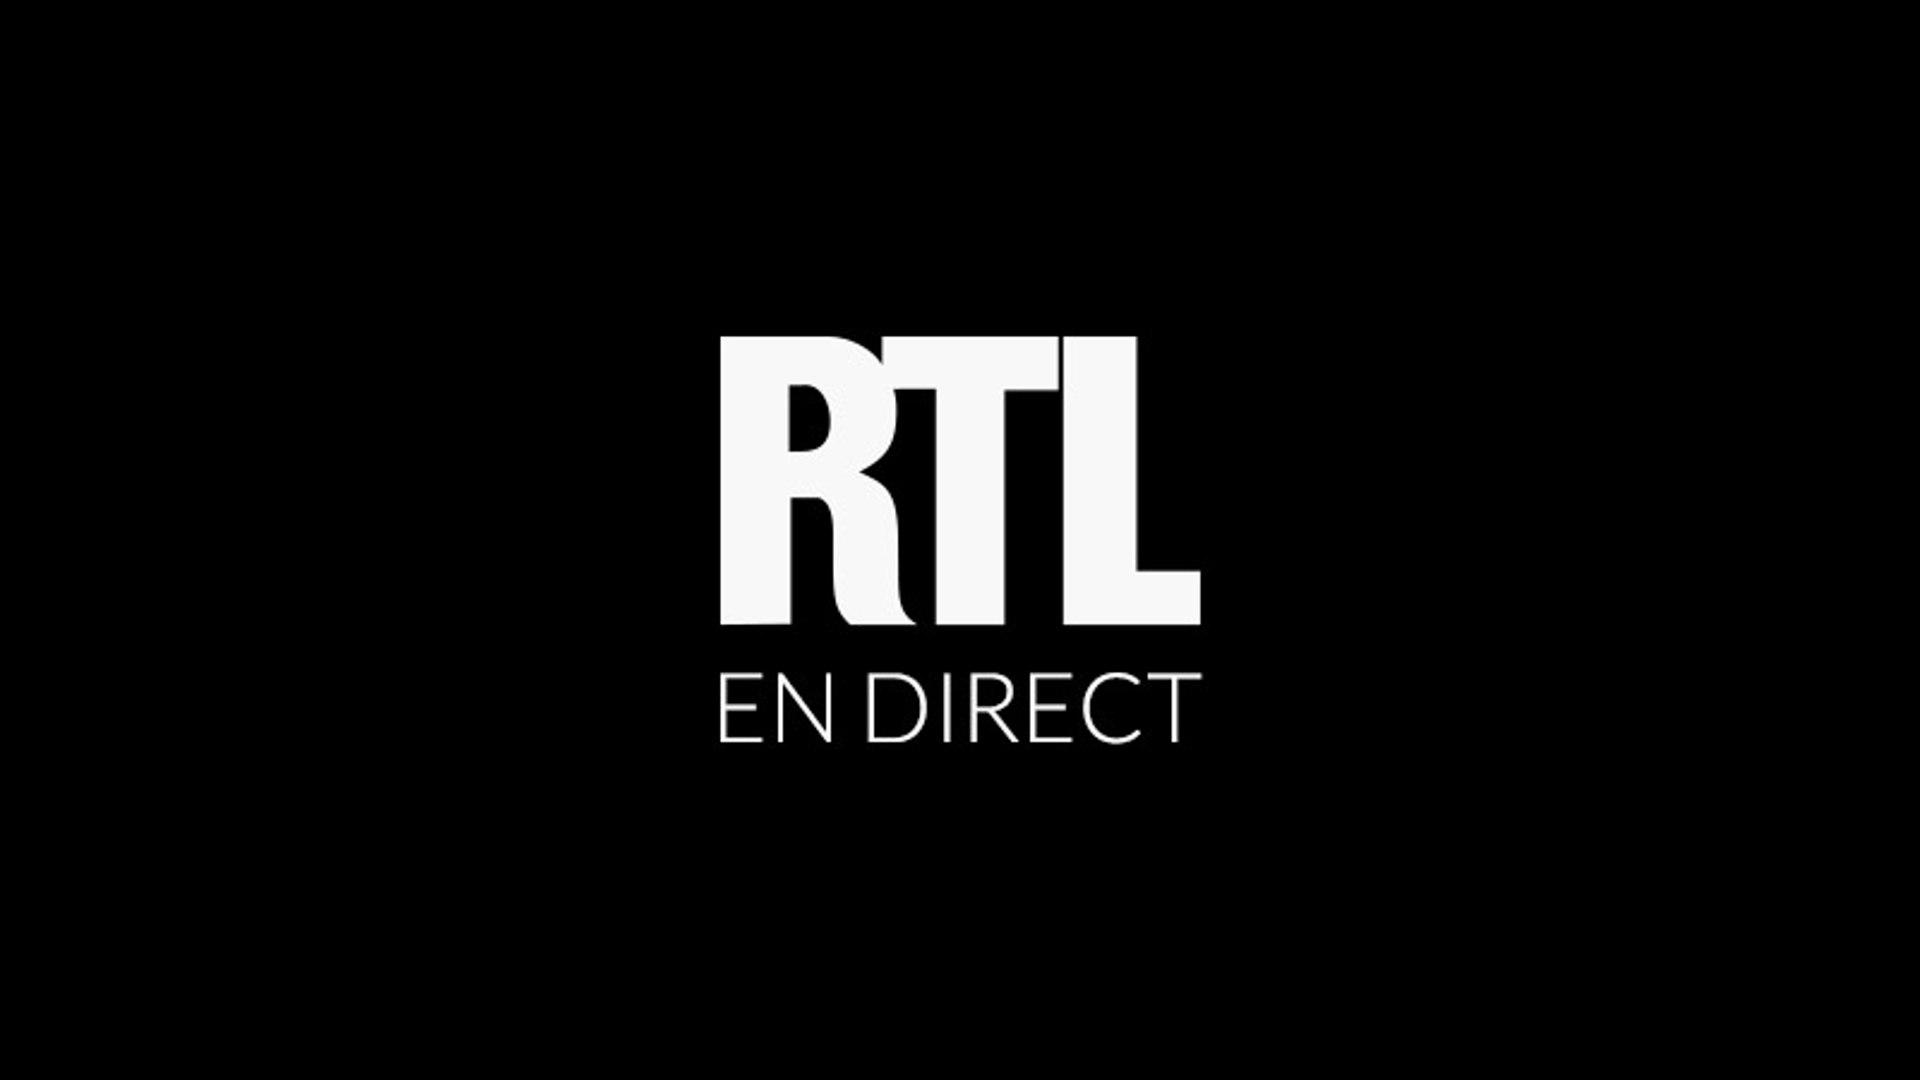 rtl hd live